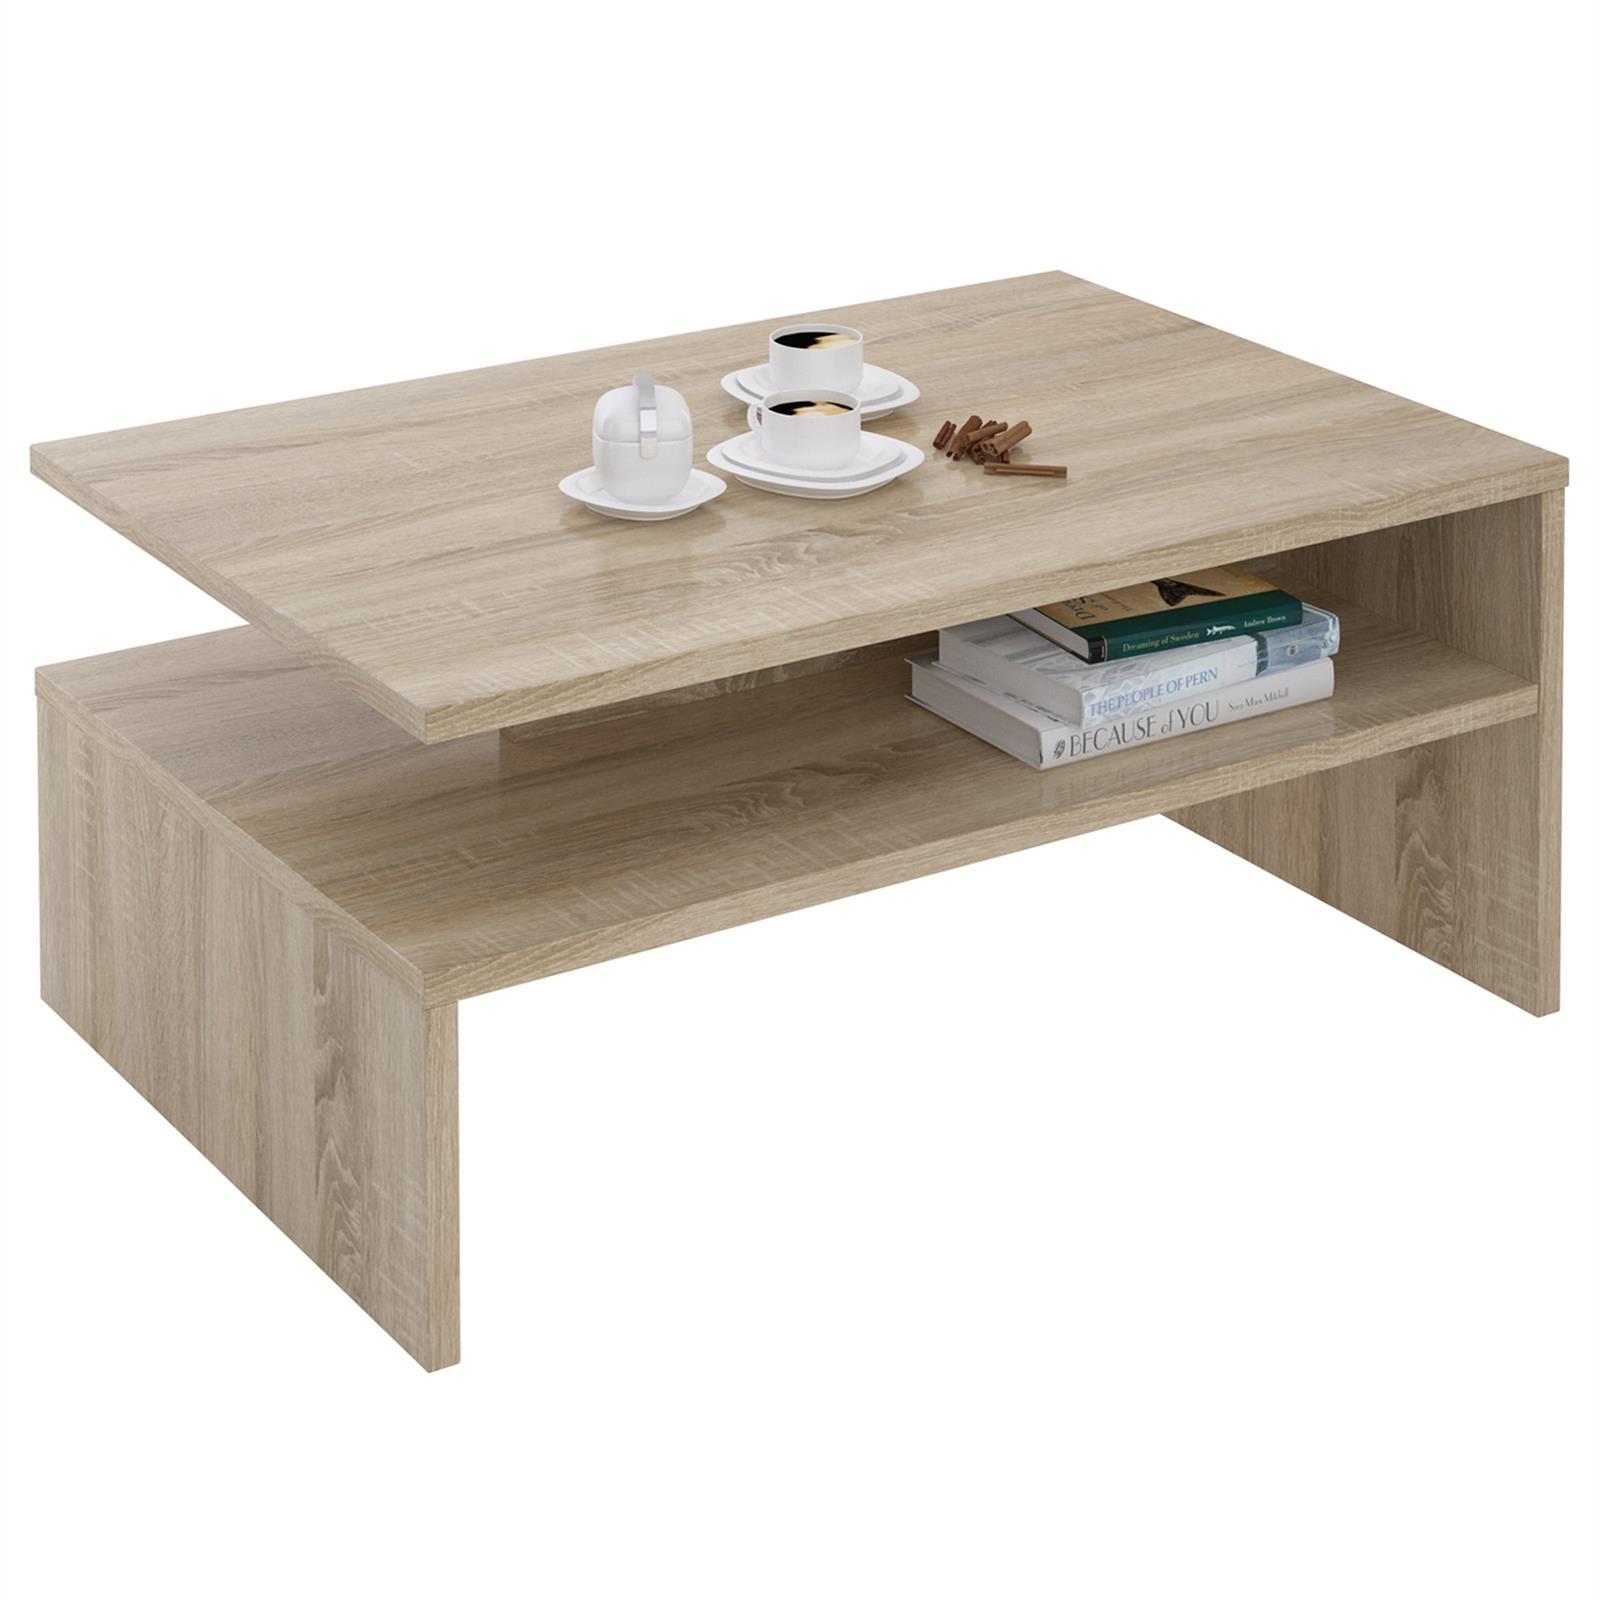 Table basse adelaide m lamin ch ne sonoma mobil meubles for Table basse sonoma